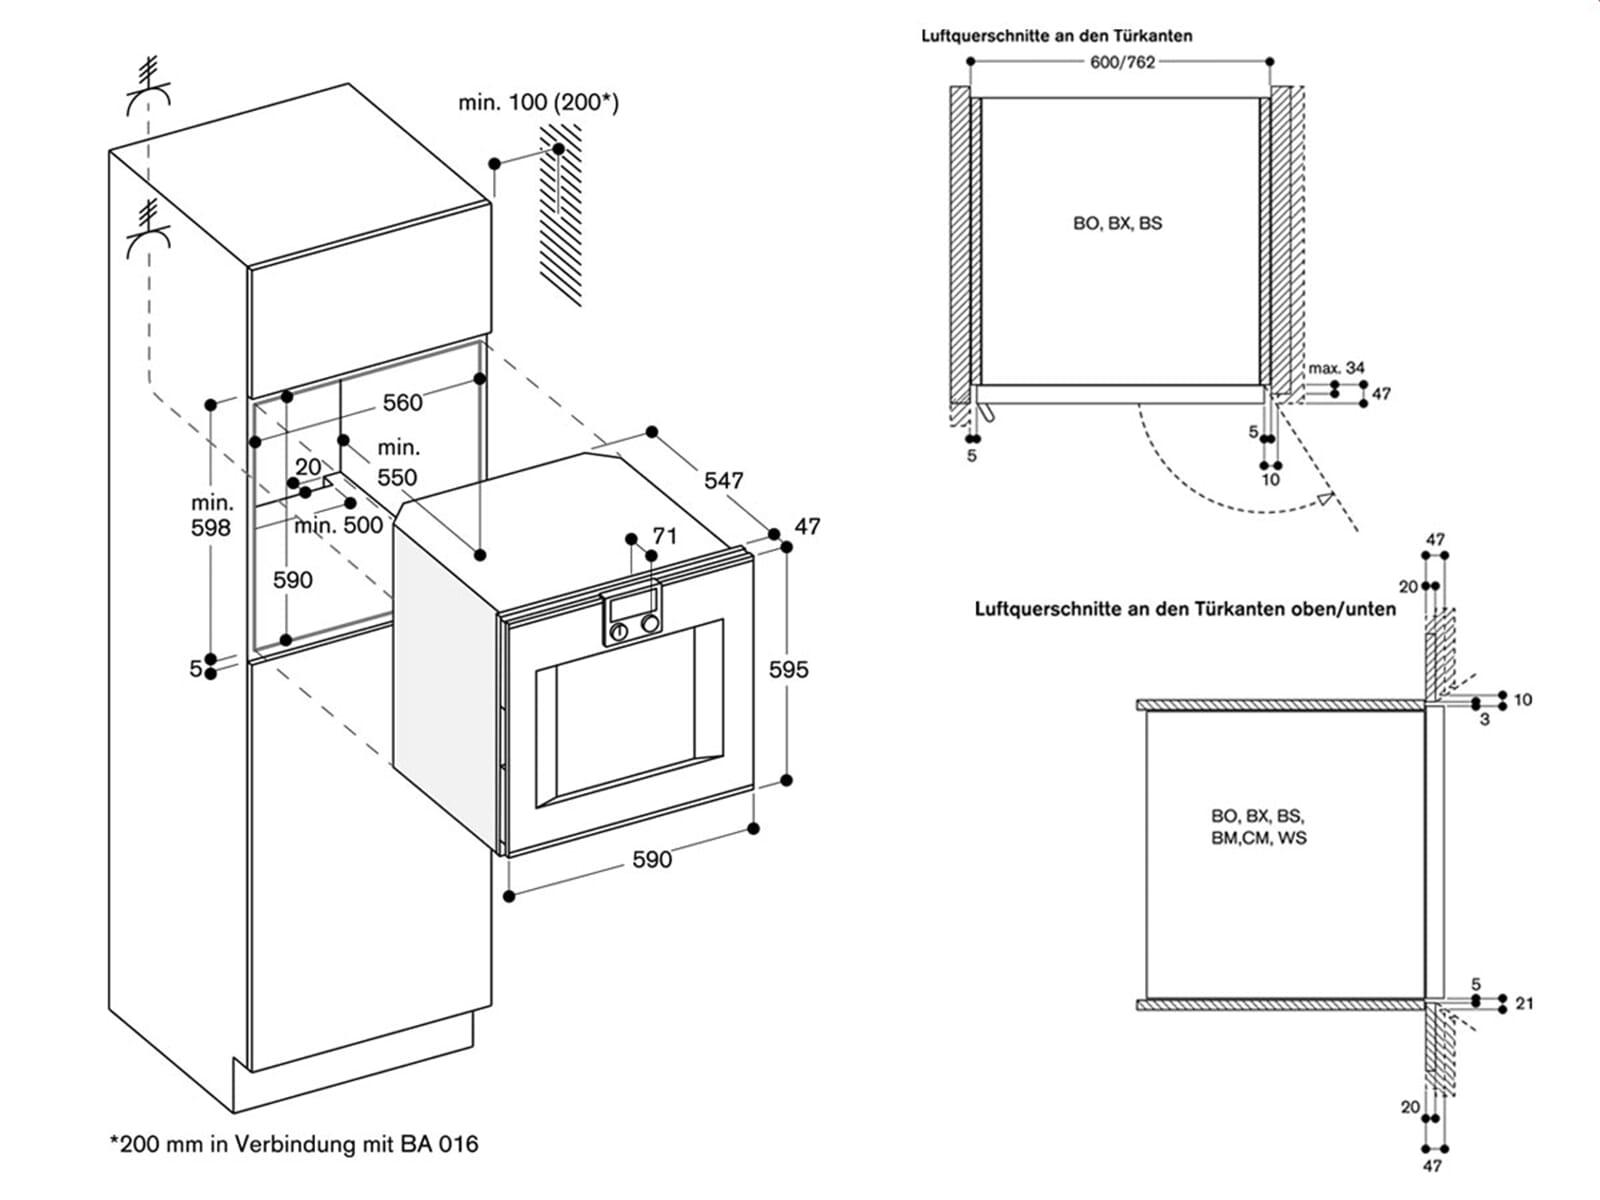 Gaggenau BO 420 111 Backofen Serie 400 Edelstahl/Glas